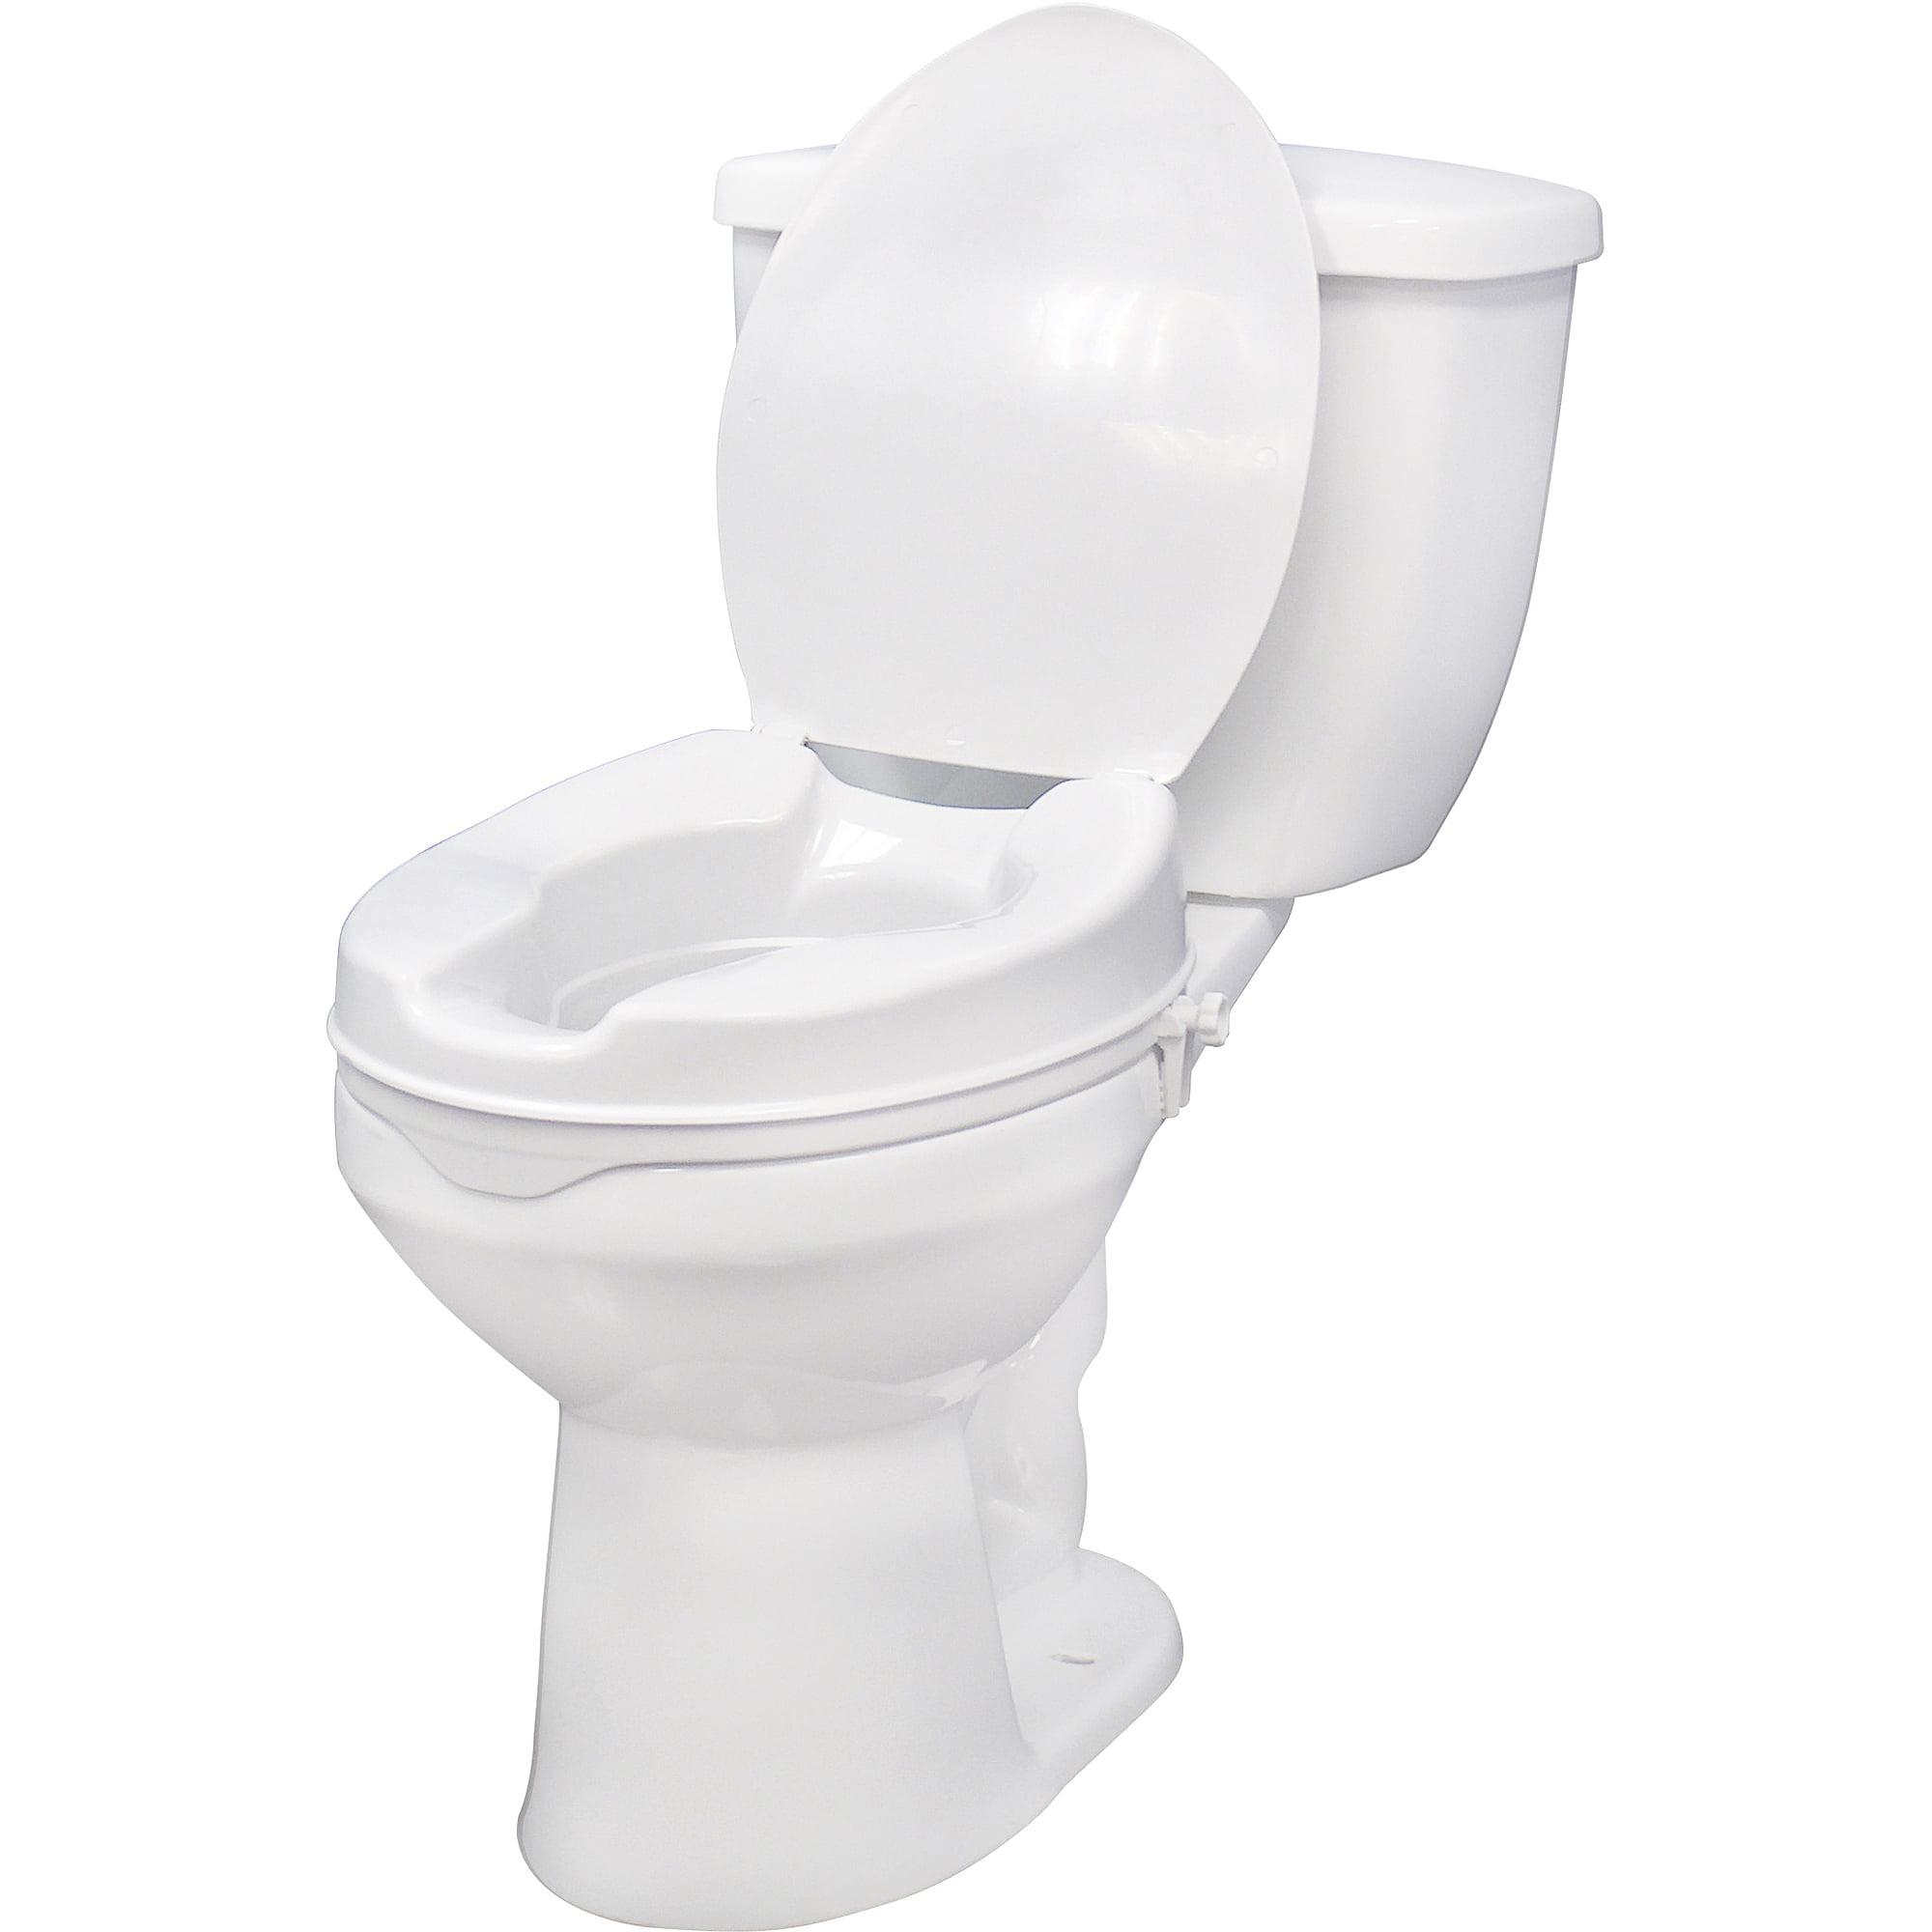 Toilet seat riser drive medical - Toilet Seat Riser Drive Medical 49